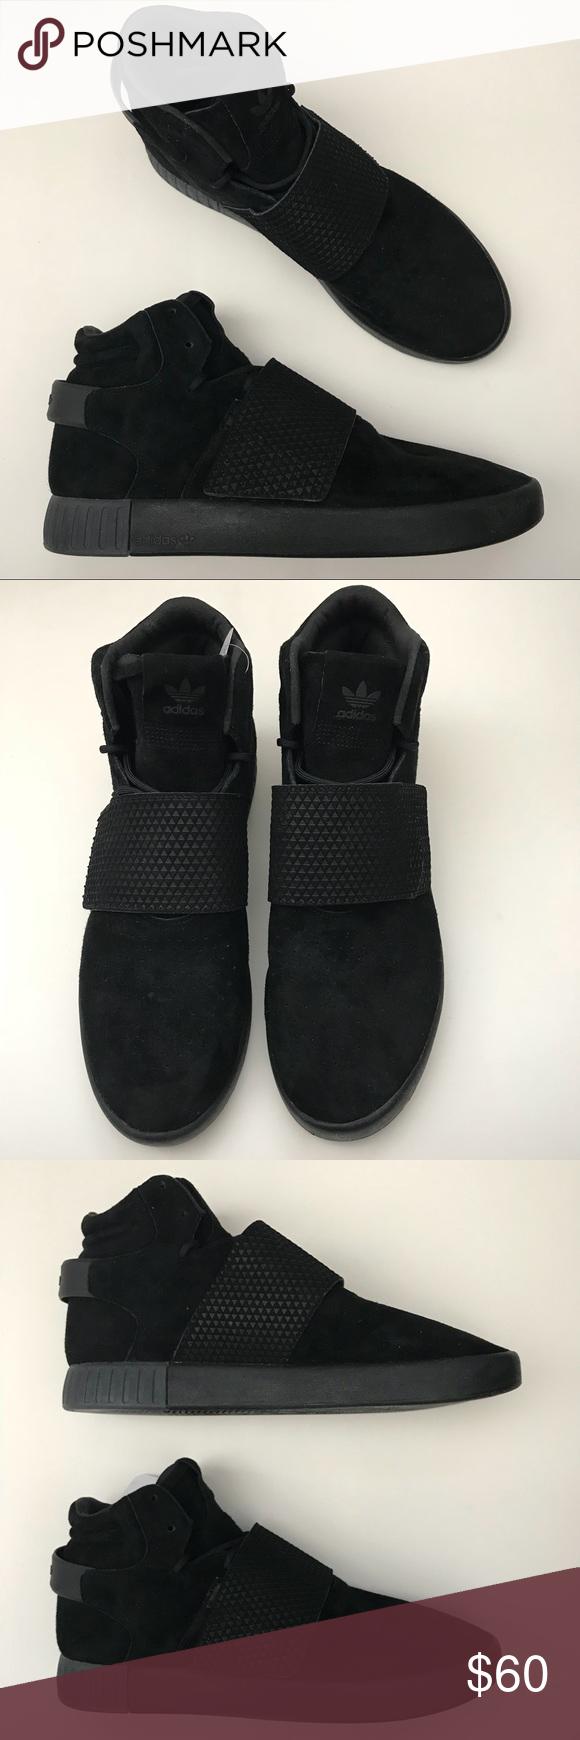 Adidas tubulare invasore cinghia scarpe da uomo nwt pinterest adidas